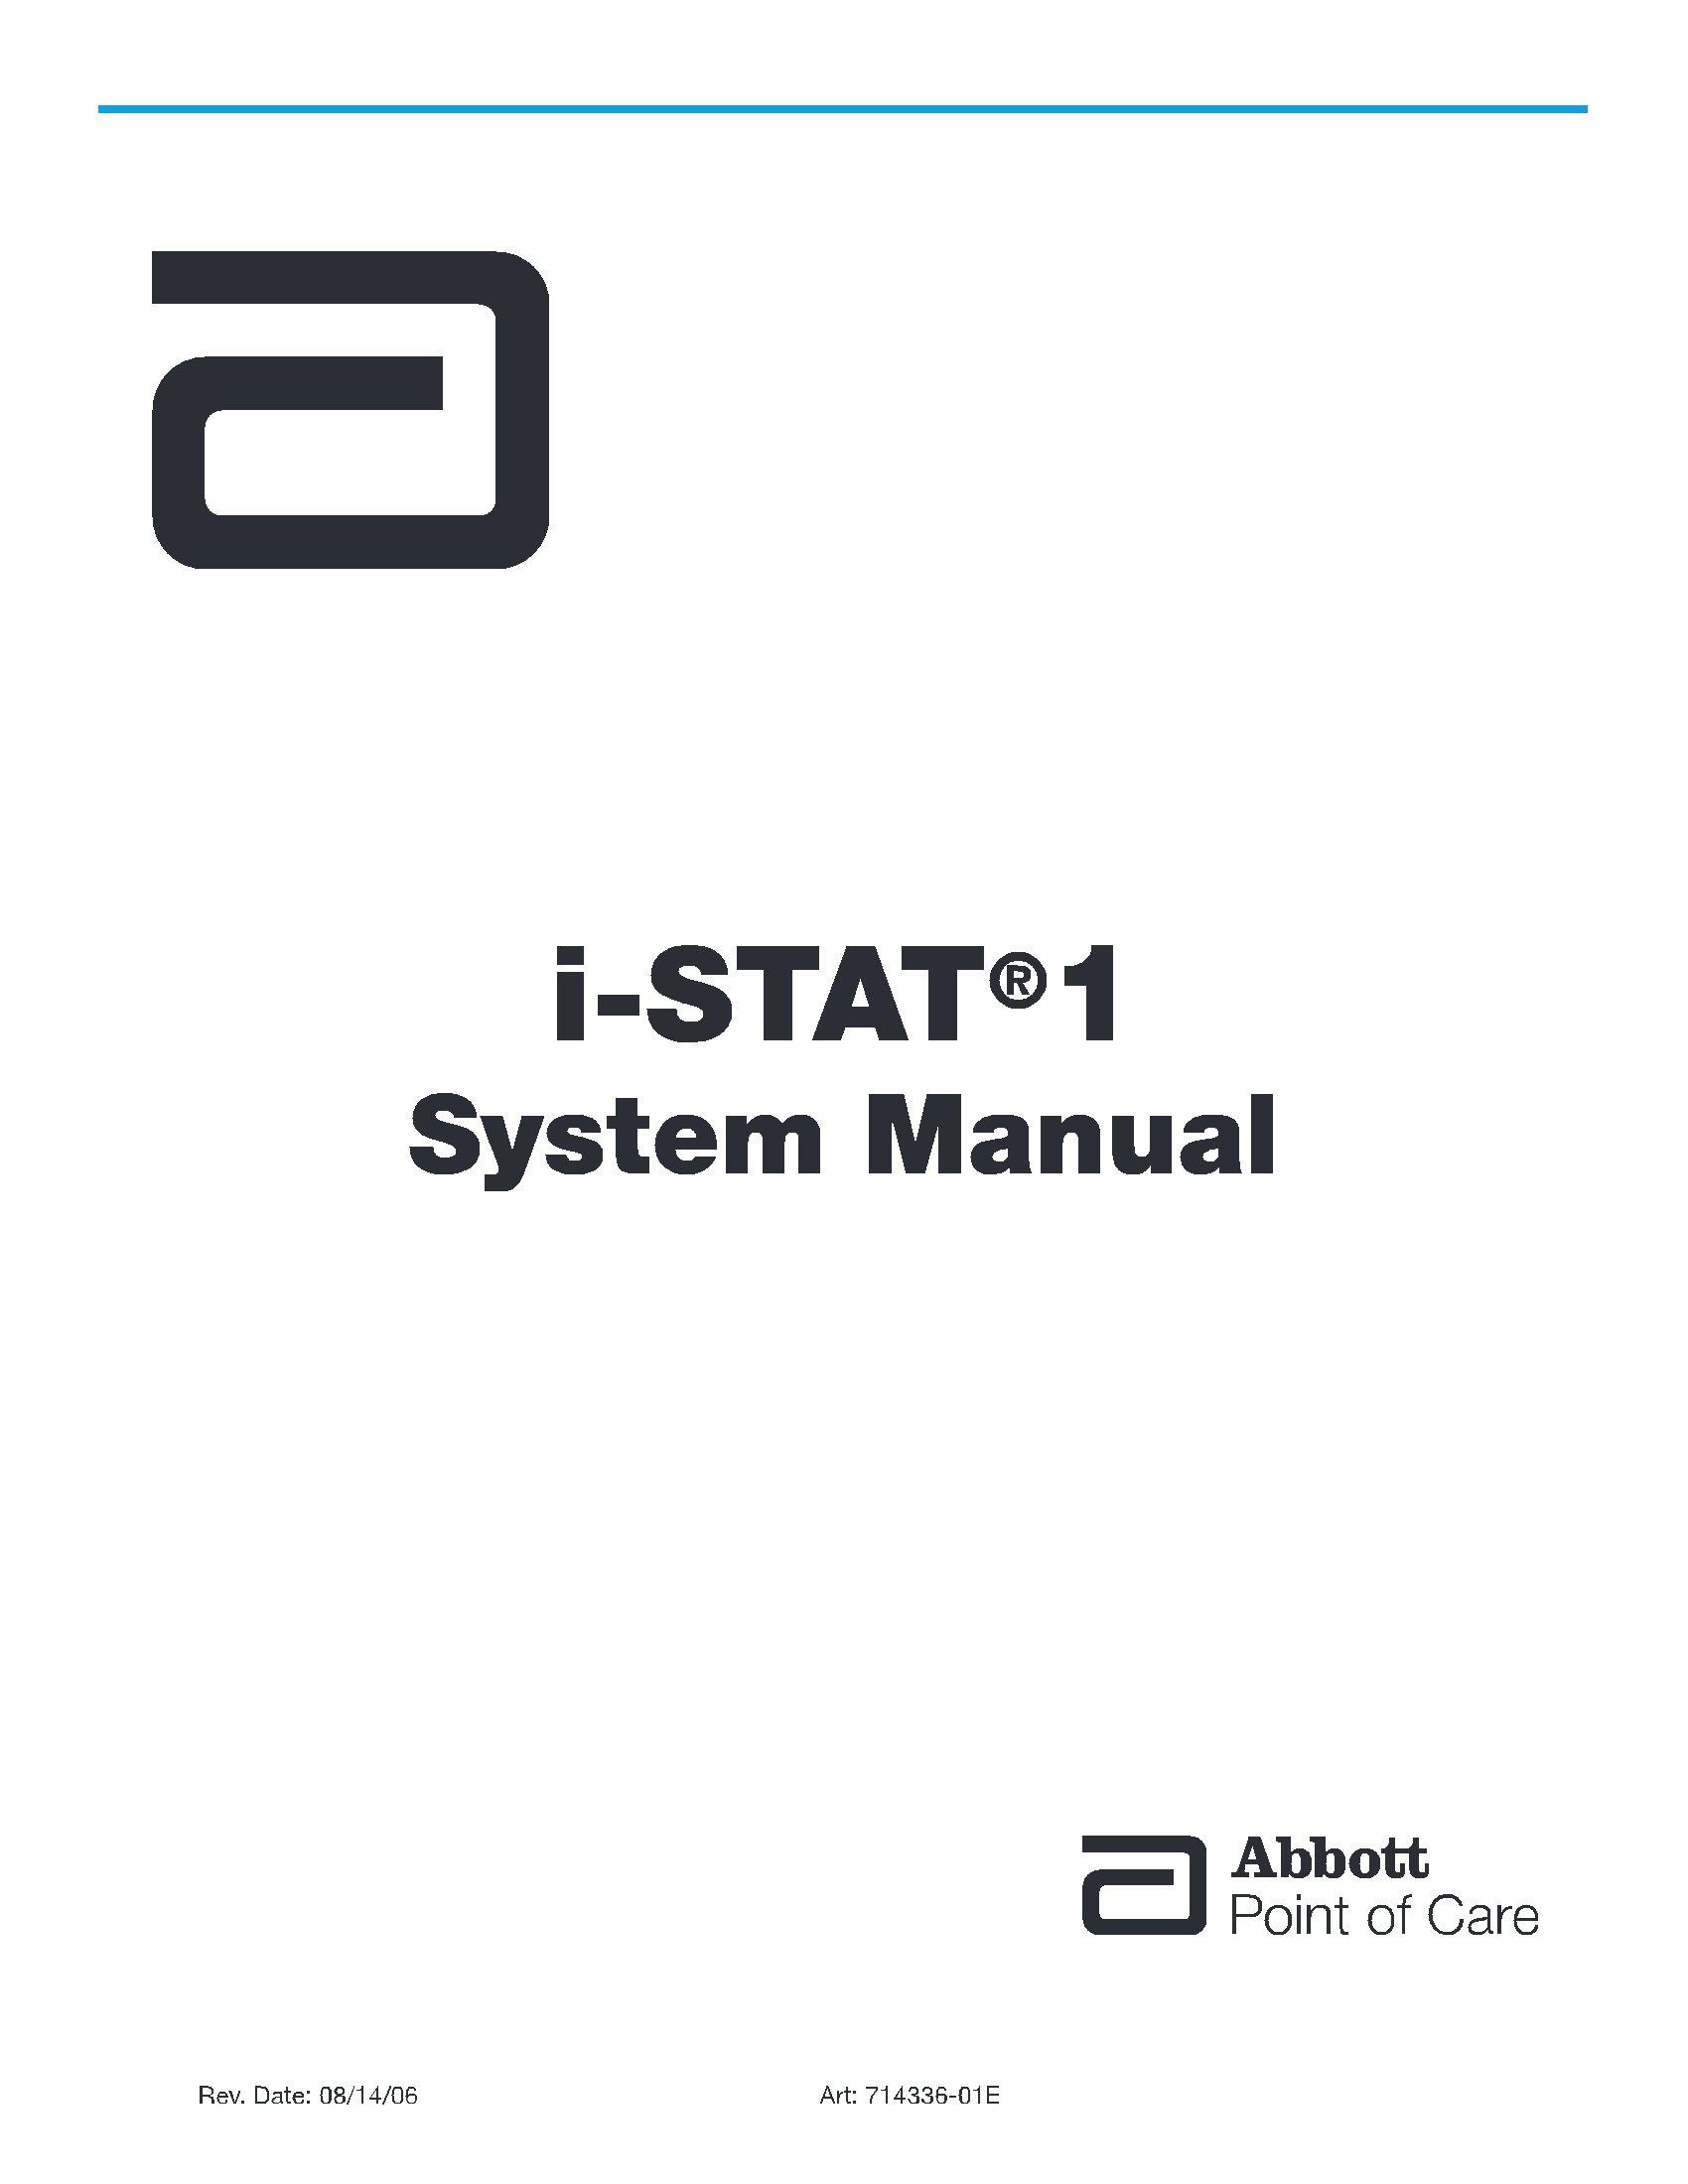 Abbott i-STAT®1 System Manual